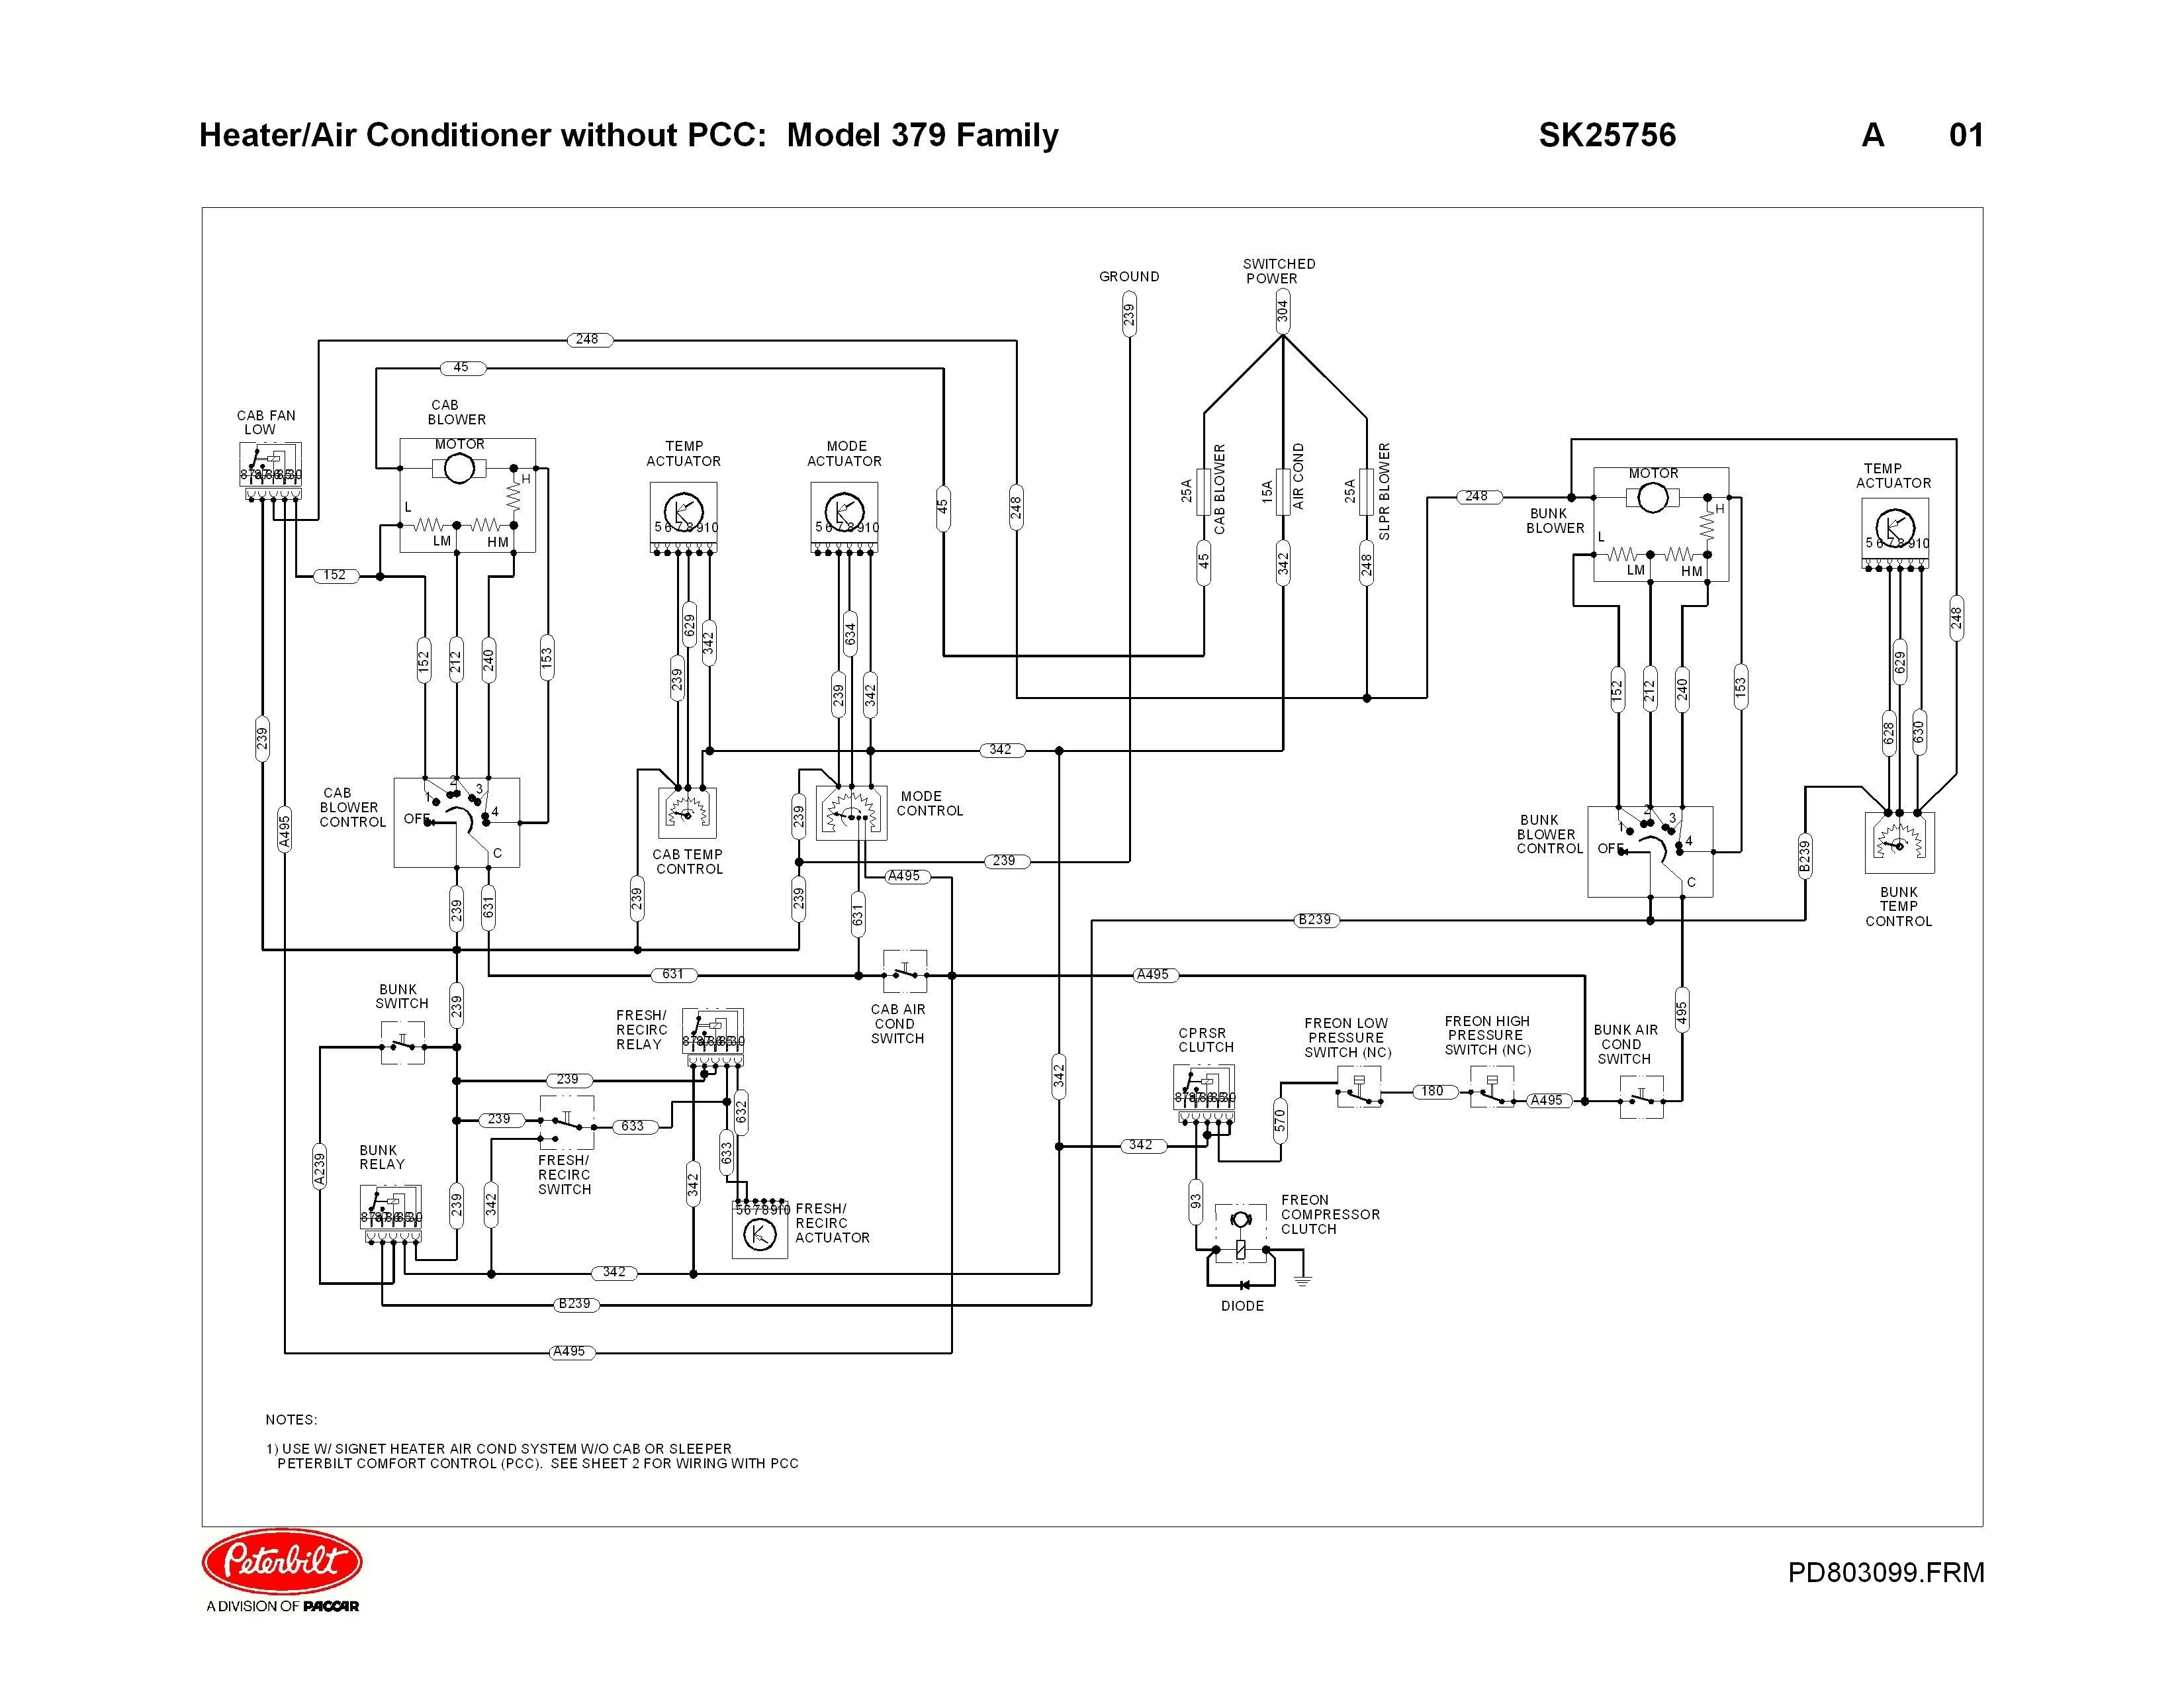 377 peterbilt wiring diagram wiring diagram377 peterbilt wiring diagram wiring schematic diagram2000 379 peterbilt wiring diagram wiring diagrams instruct 98 peterbilt